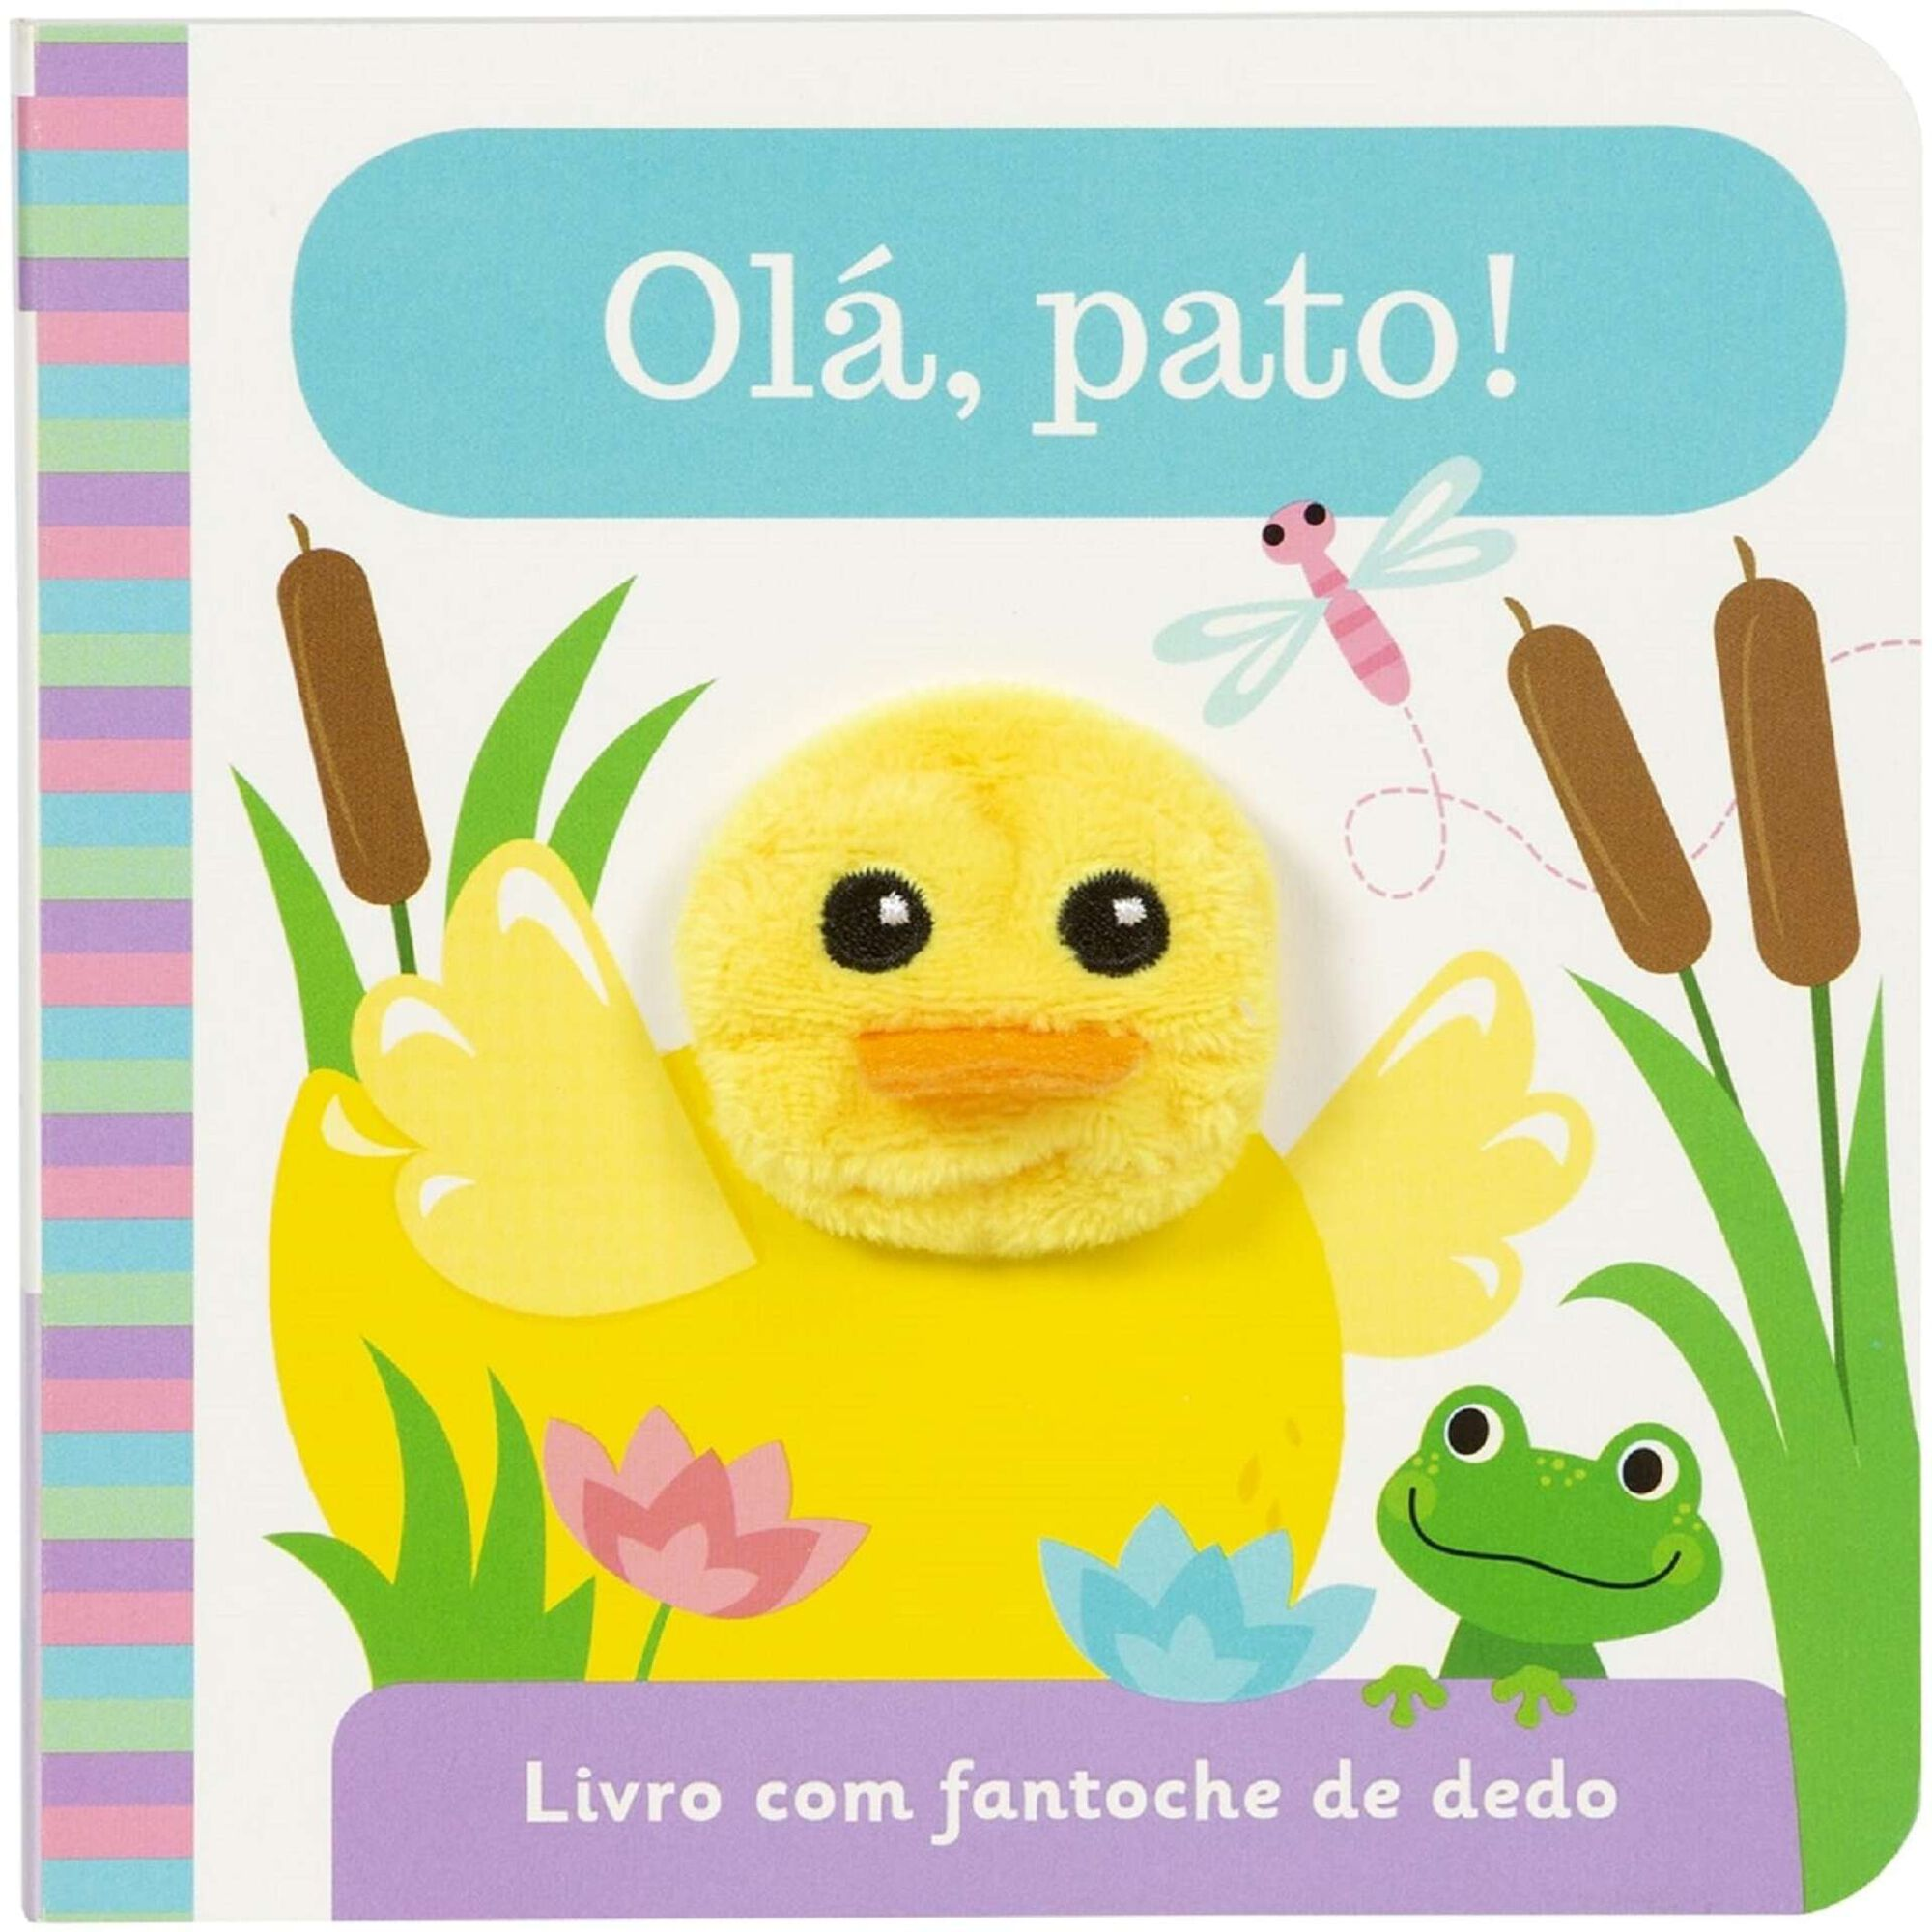 Fantoche de Dedo - Olá, Pato!